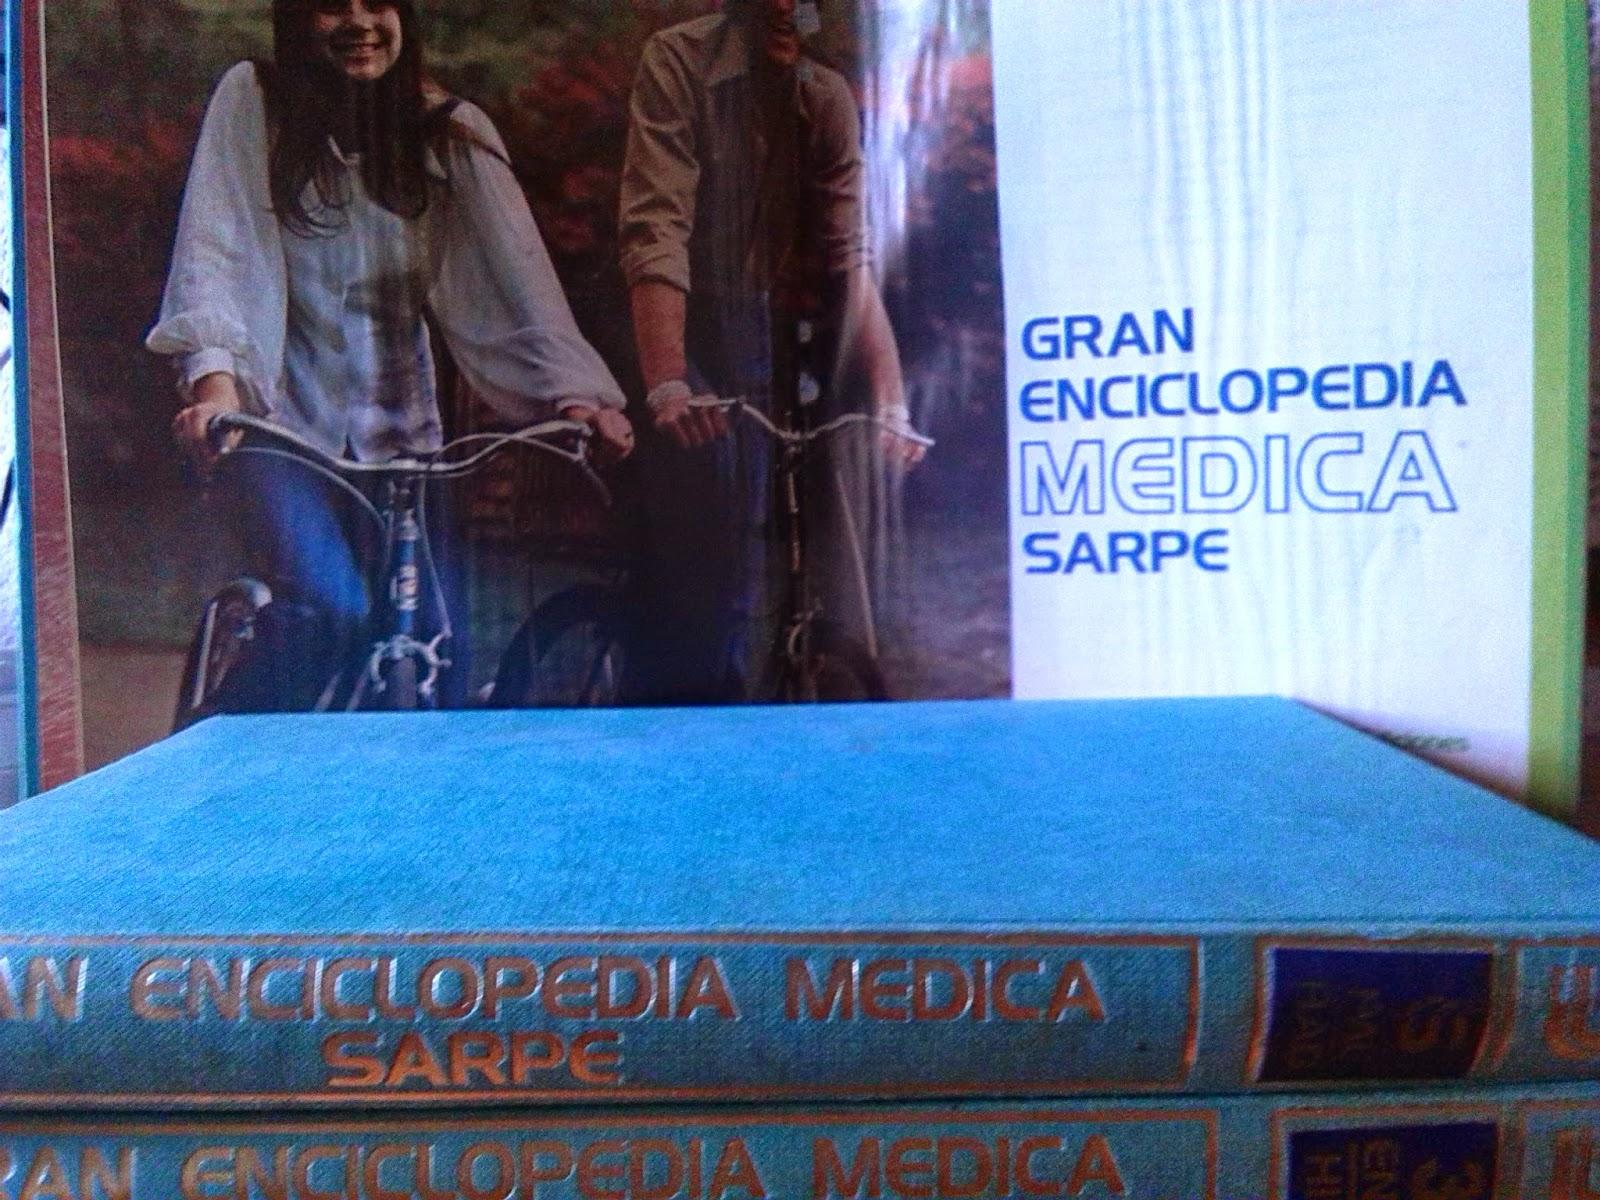 gran enciclopedia medica sarpe